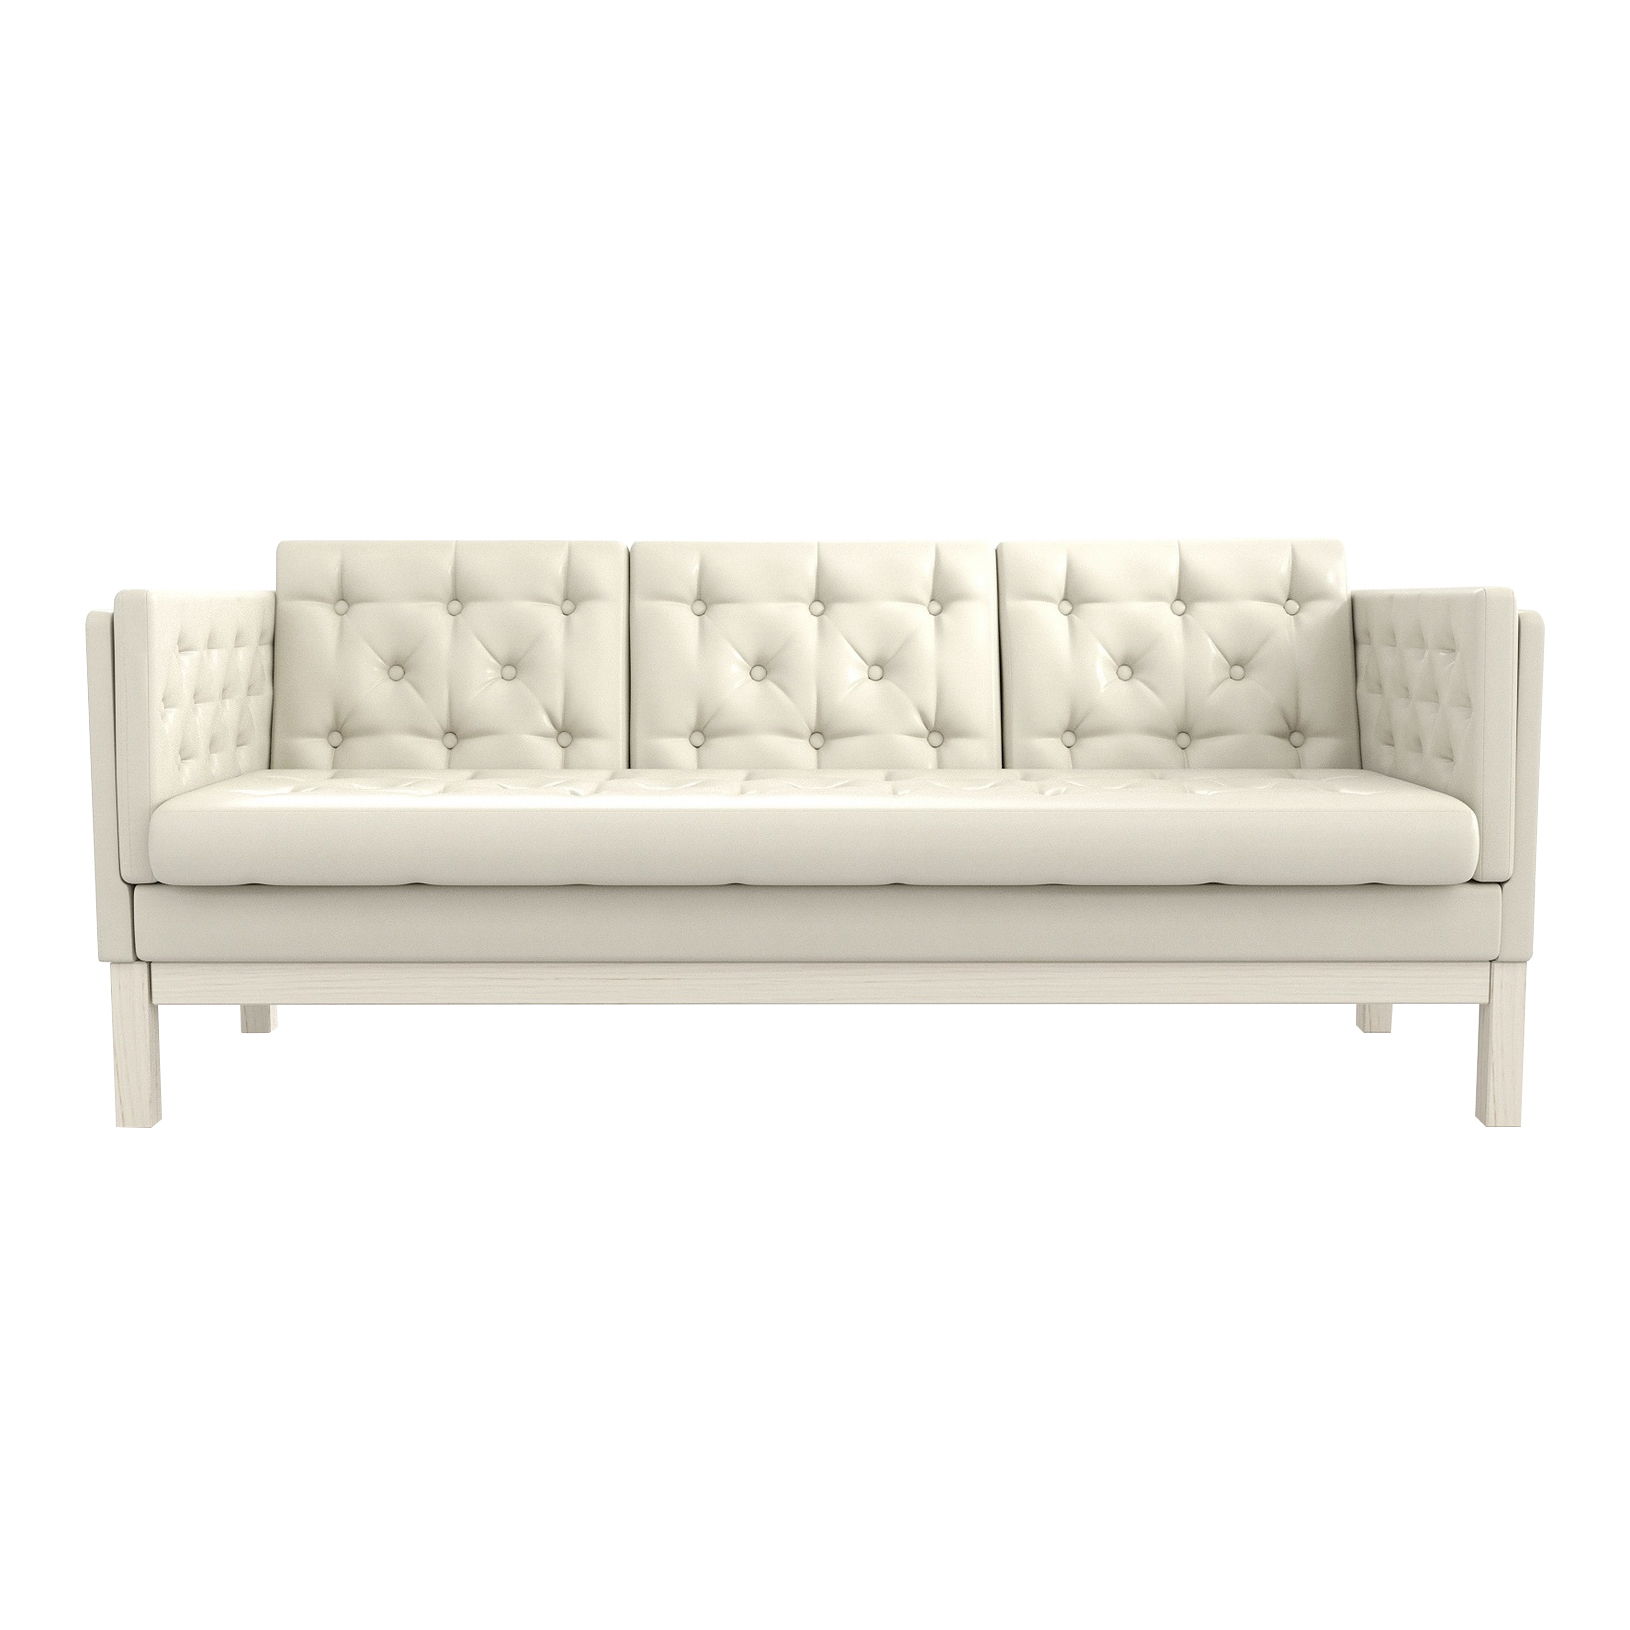 Фото - Диван AS Алана б 193x82x83 беленый дуб/белый диван as алана м 154x82x83 сосна коричневый